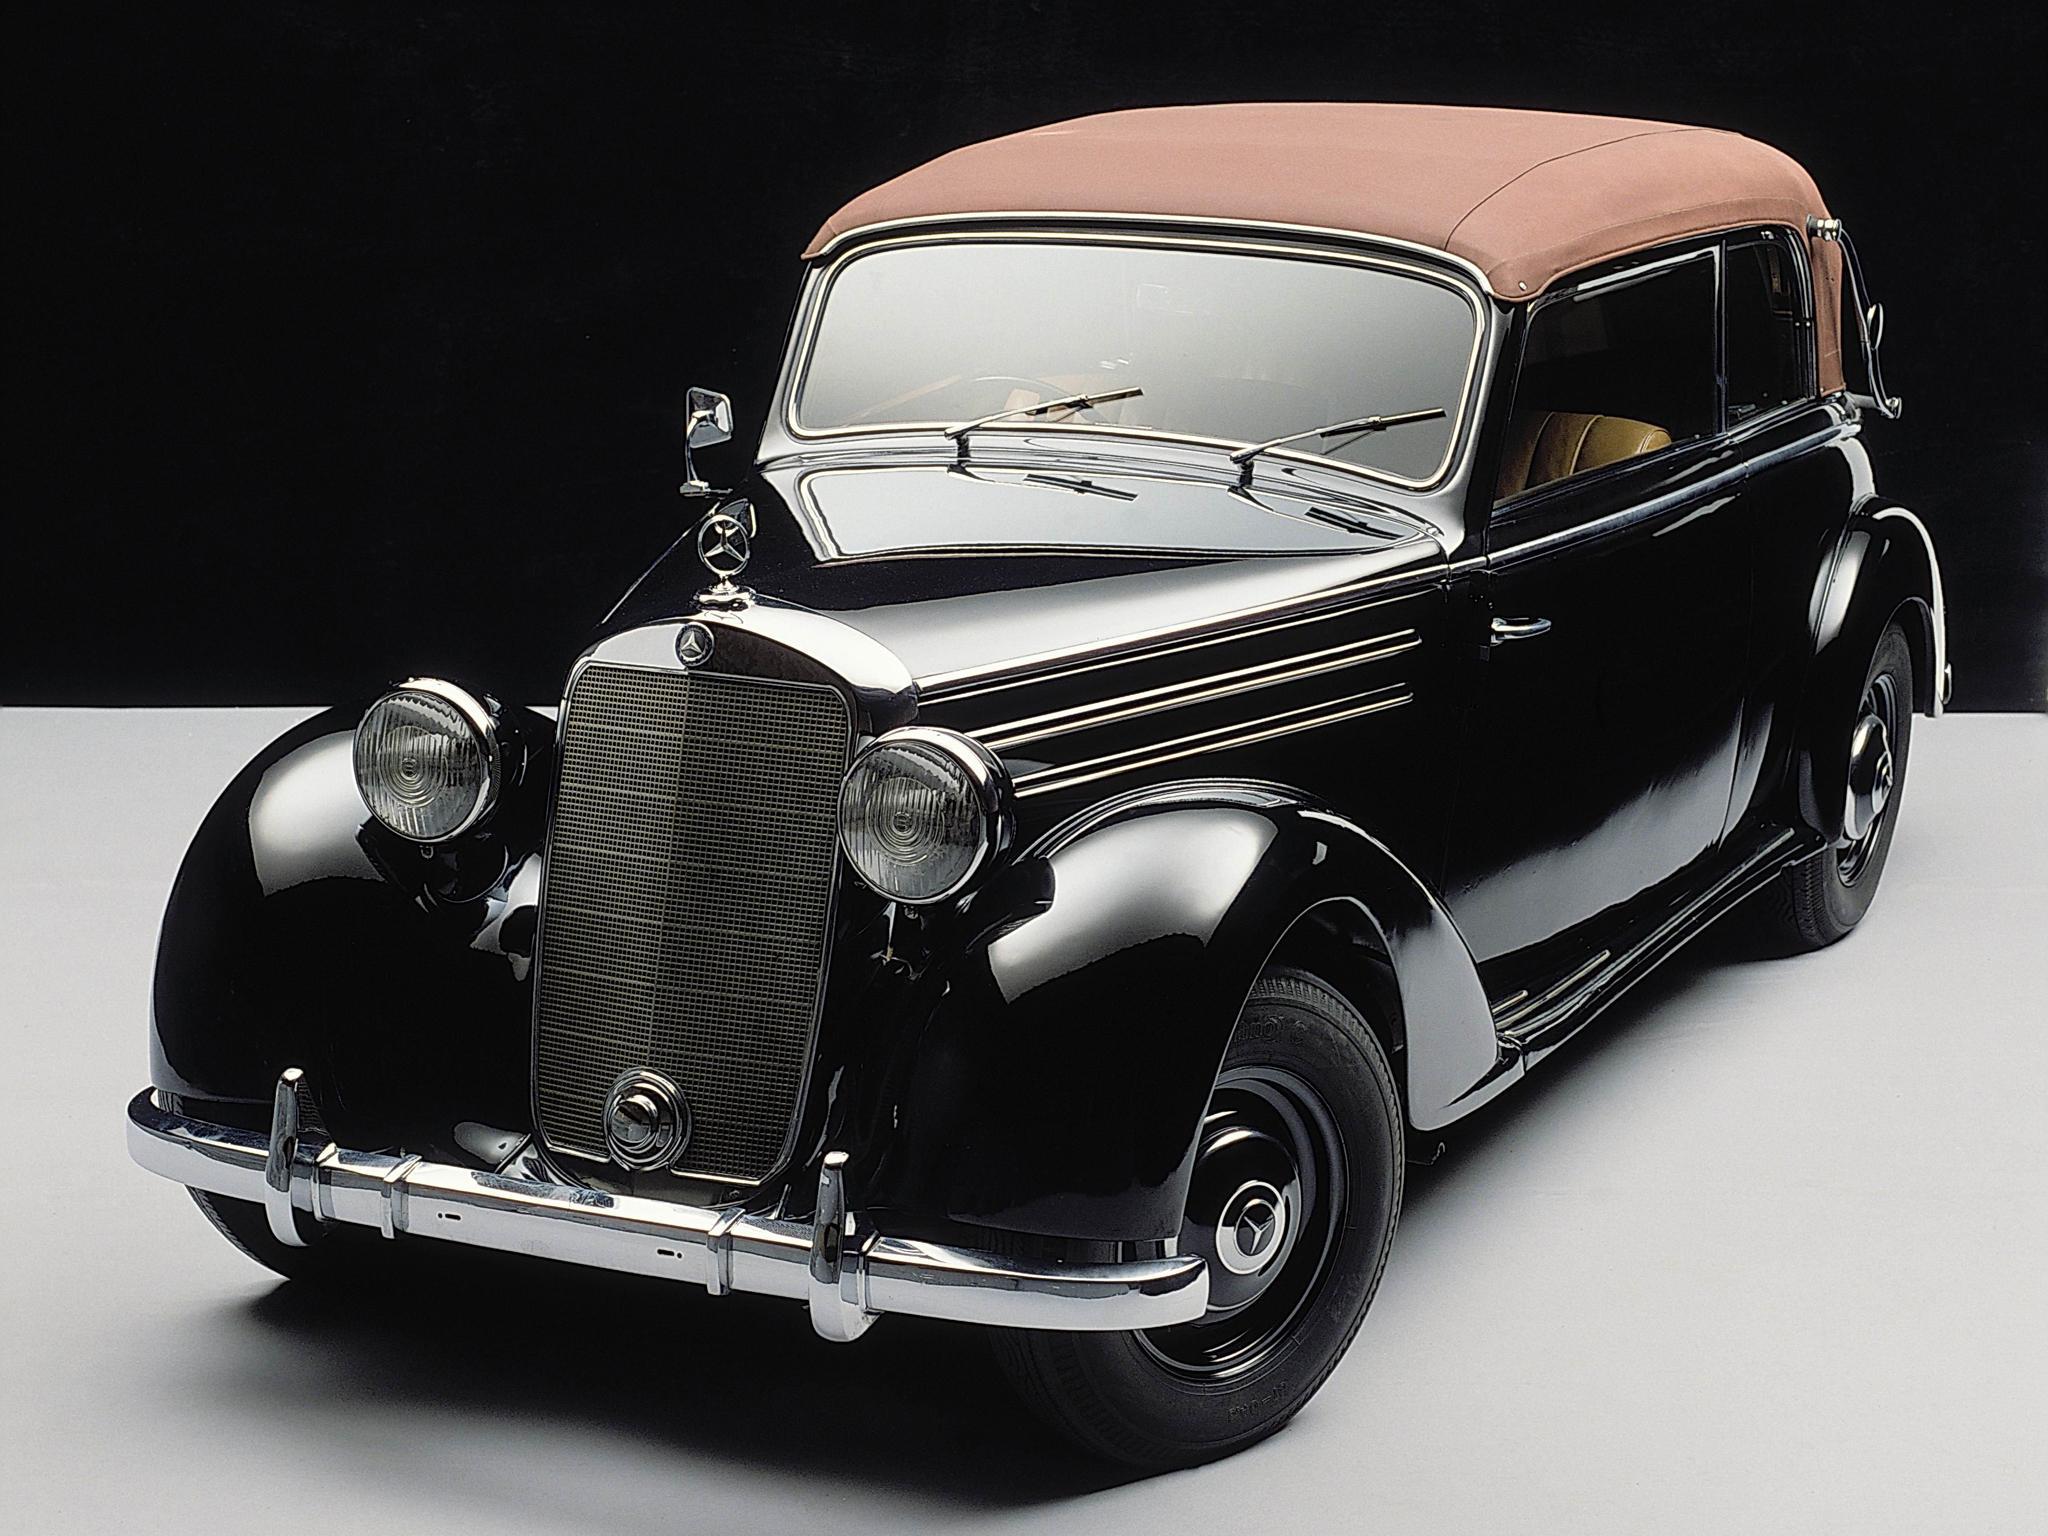 Wallpaper Mercedes Benz Luxury Vintage Car Classic Car Retro